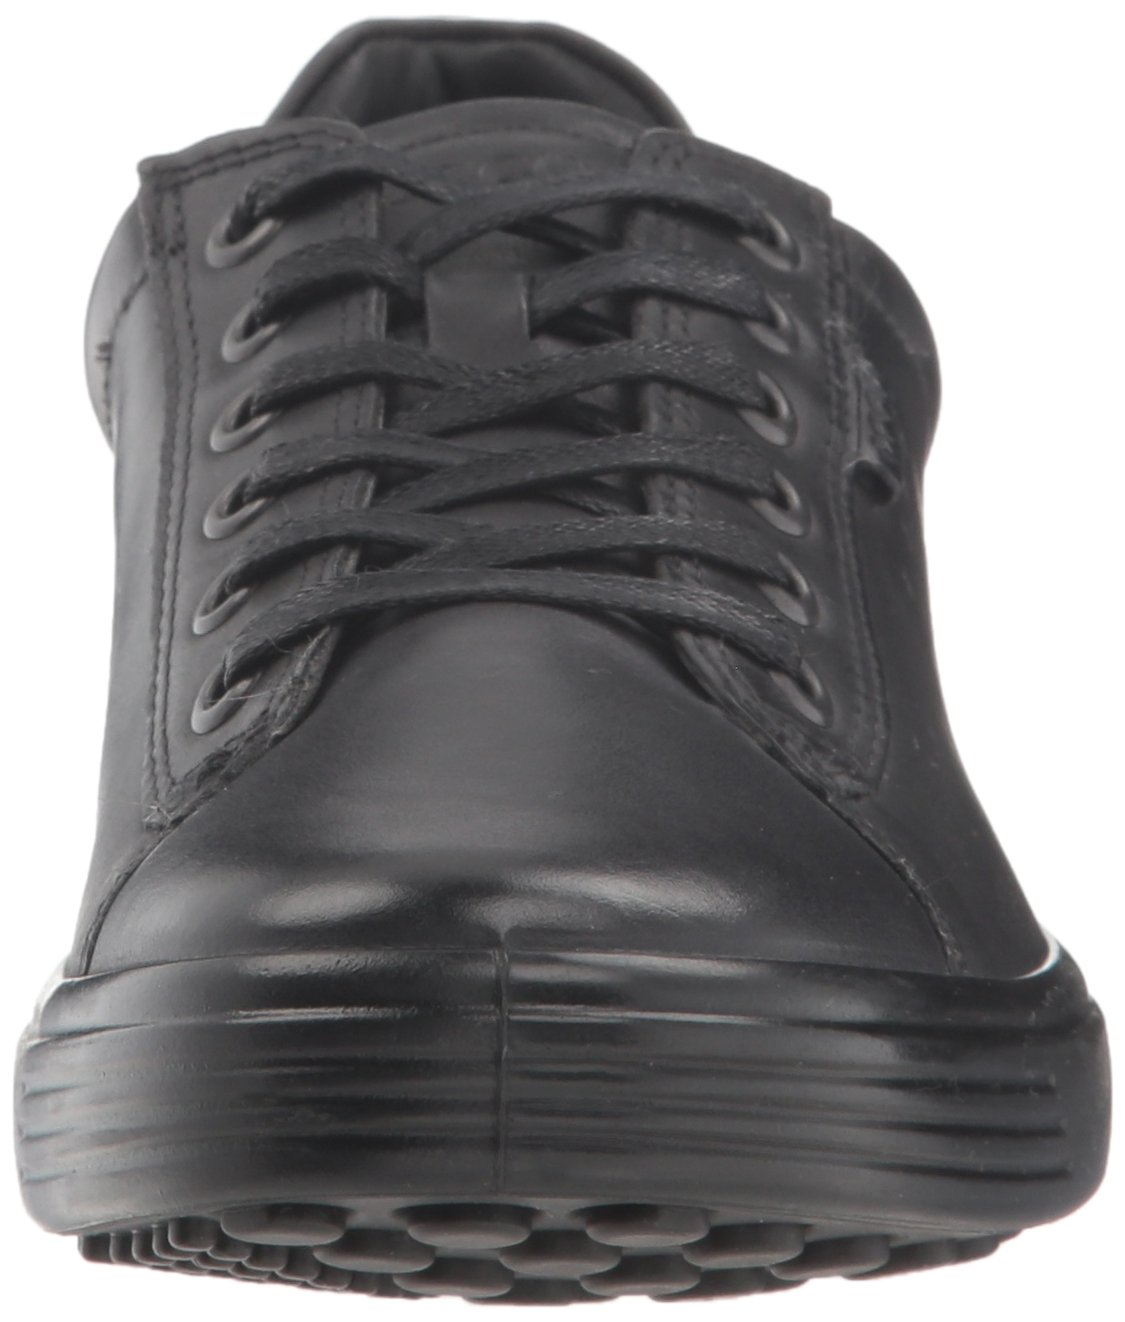 ECCO Women's Soft Sneaker B0775361HP 40 M EU (9-9.5 US)|Black/Black